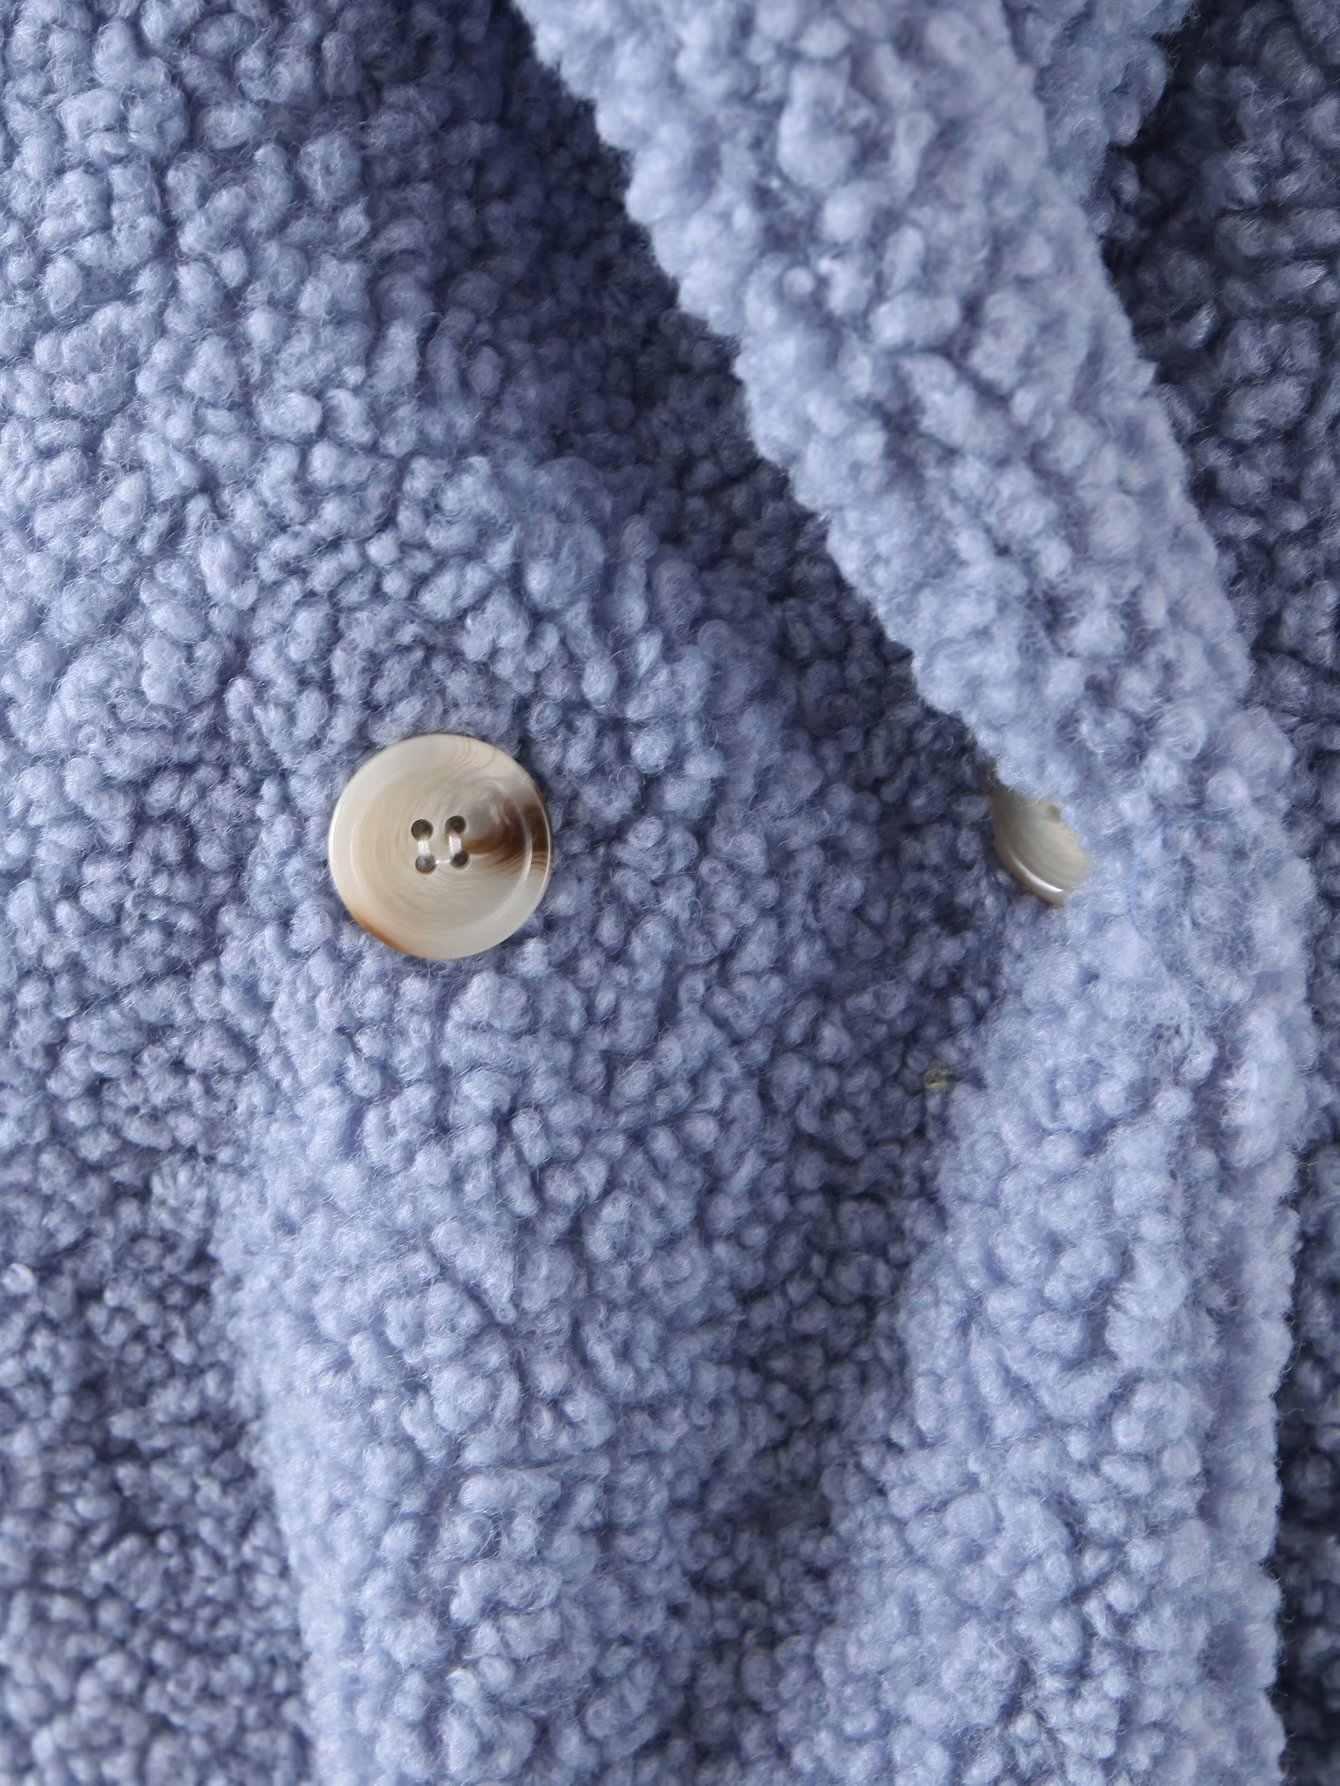 Musim Dingin Bulu Mantel Wanita Tombol Kasmir Mantel Besar Longgar Jaket Lembut Hangat Lebih Tahan Dr